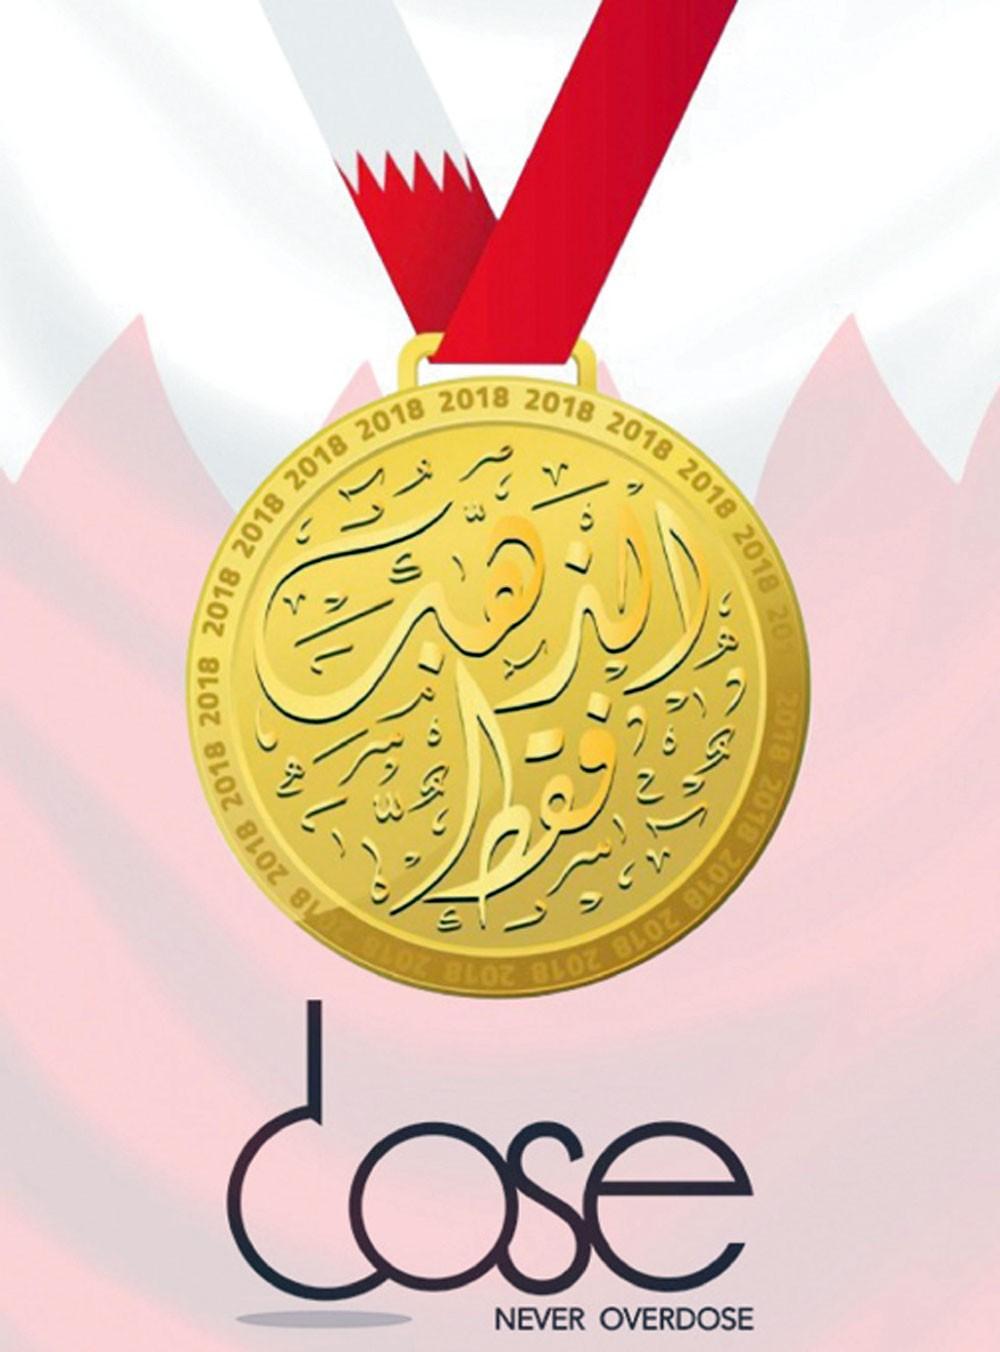 """دوز كافيه"" ترصد 500 دينار لمن يحصد الذهب"